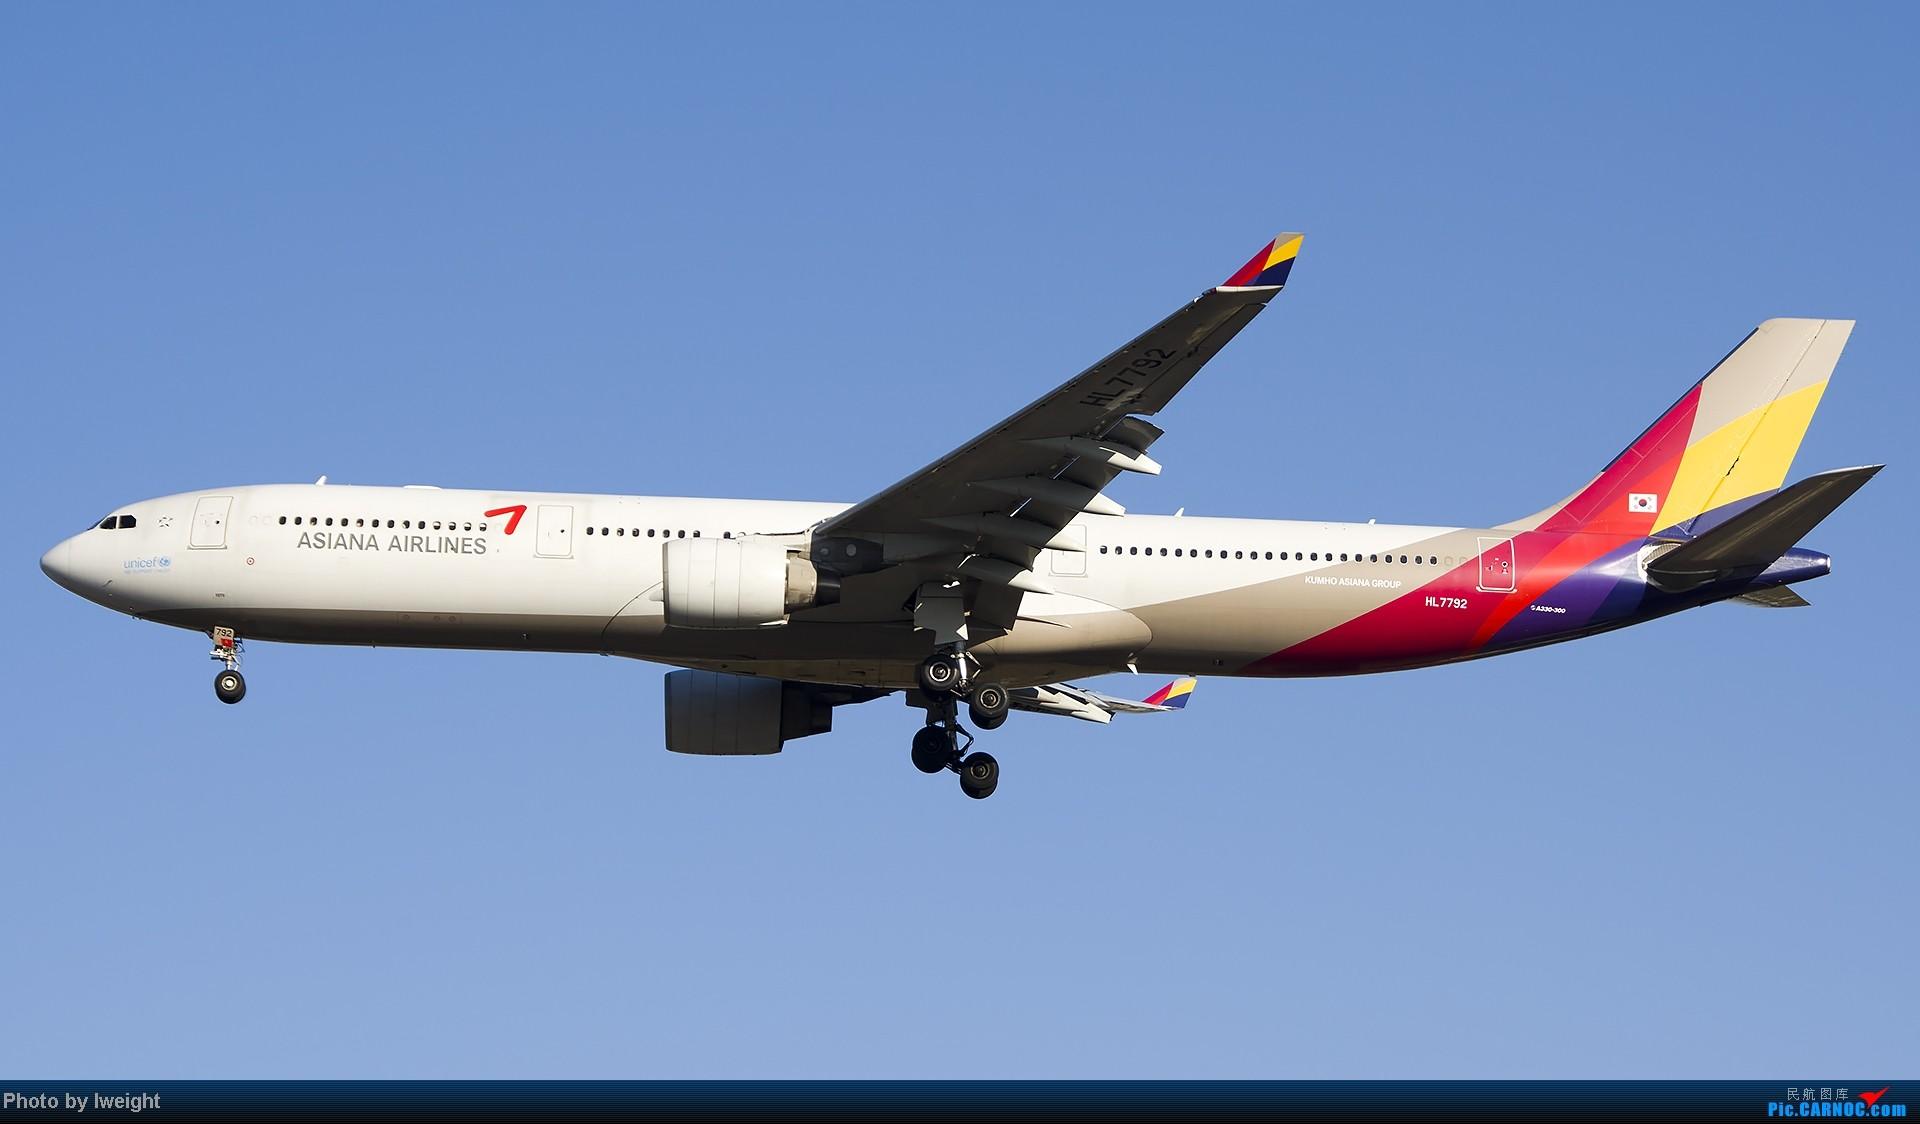 Re:[原创]抓住APEC蓝的尾巴,再拍上一组 AIRBUS A330-300 HL7792 中国北京首都机场